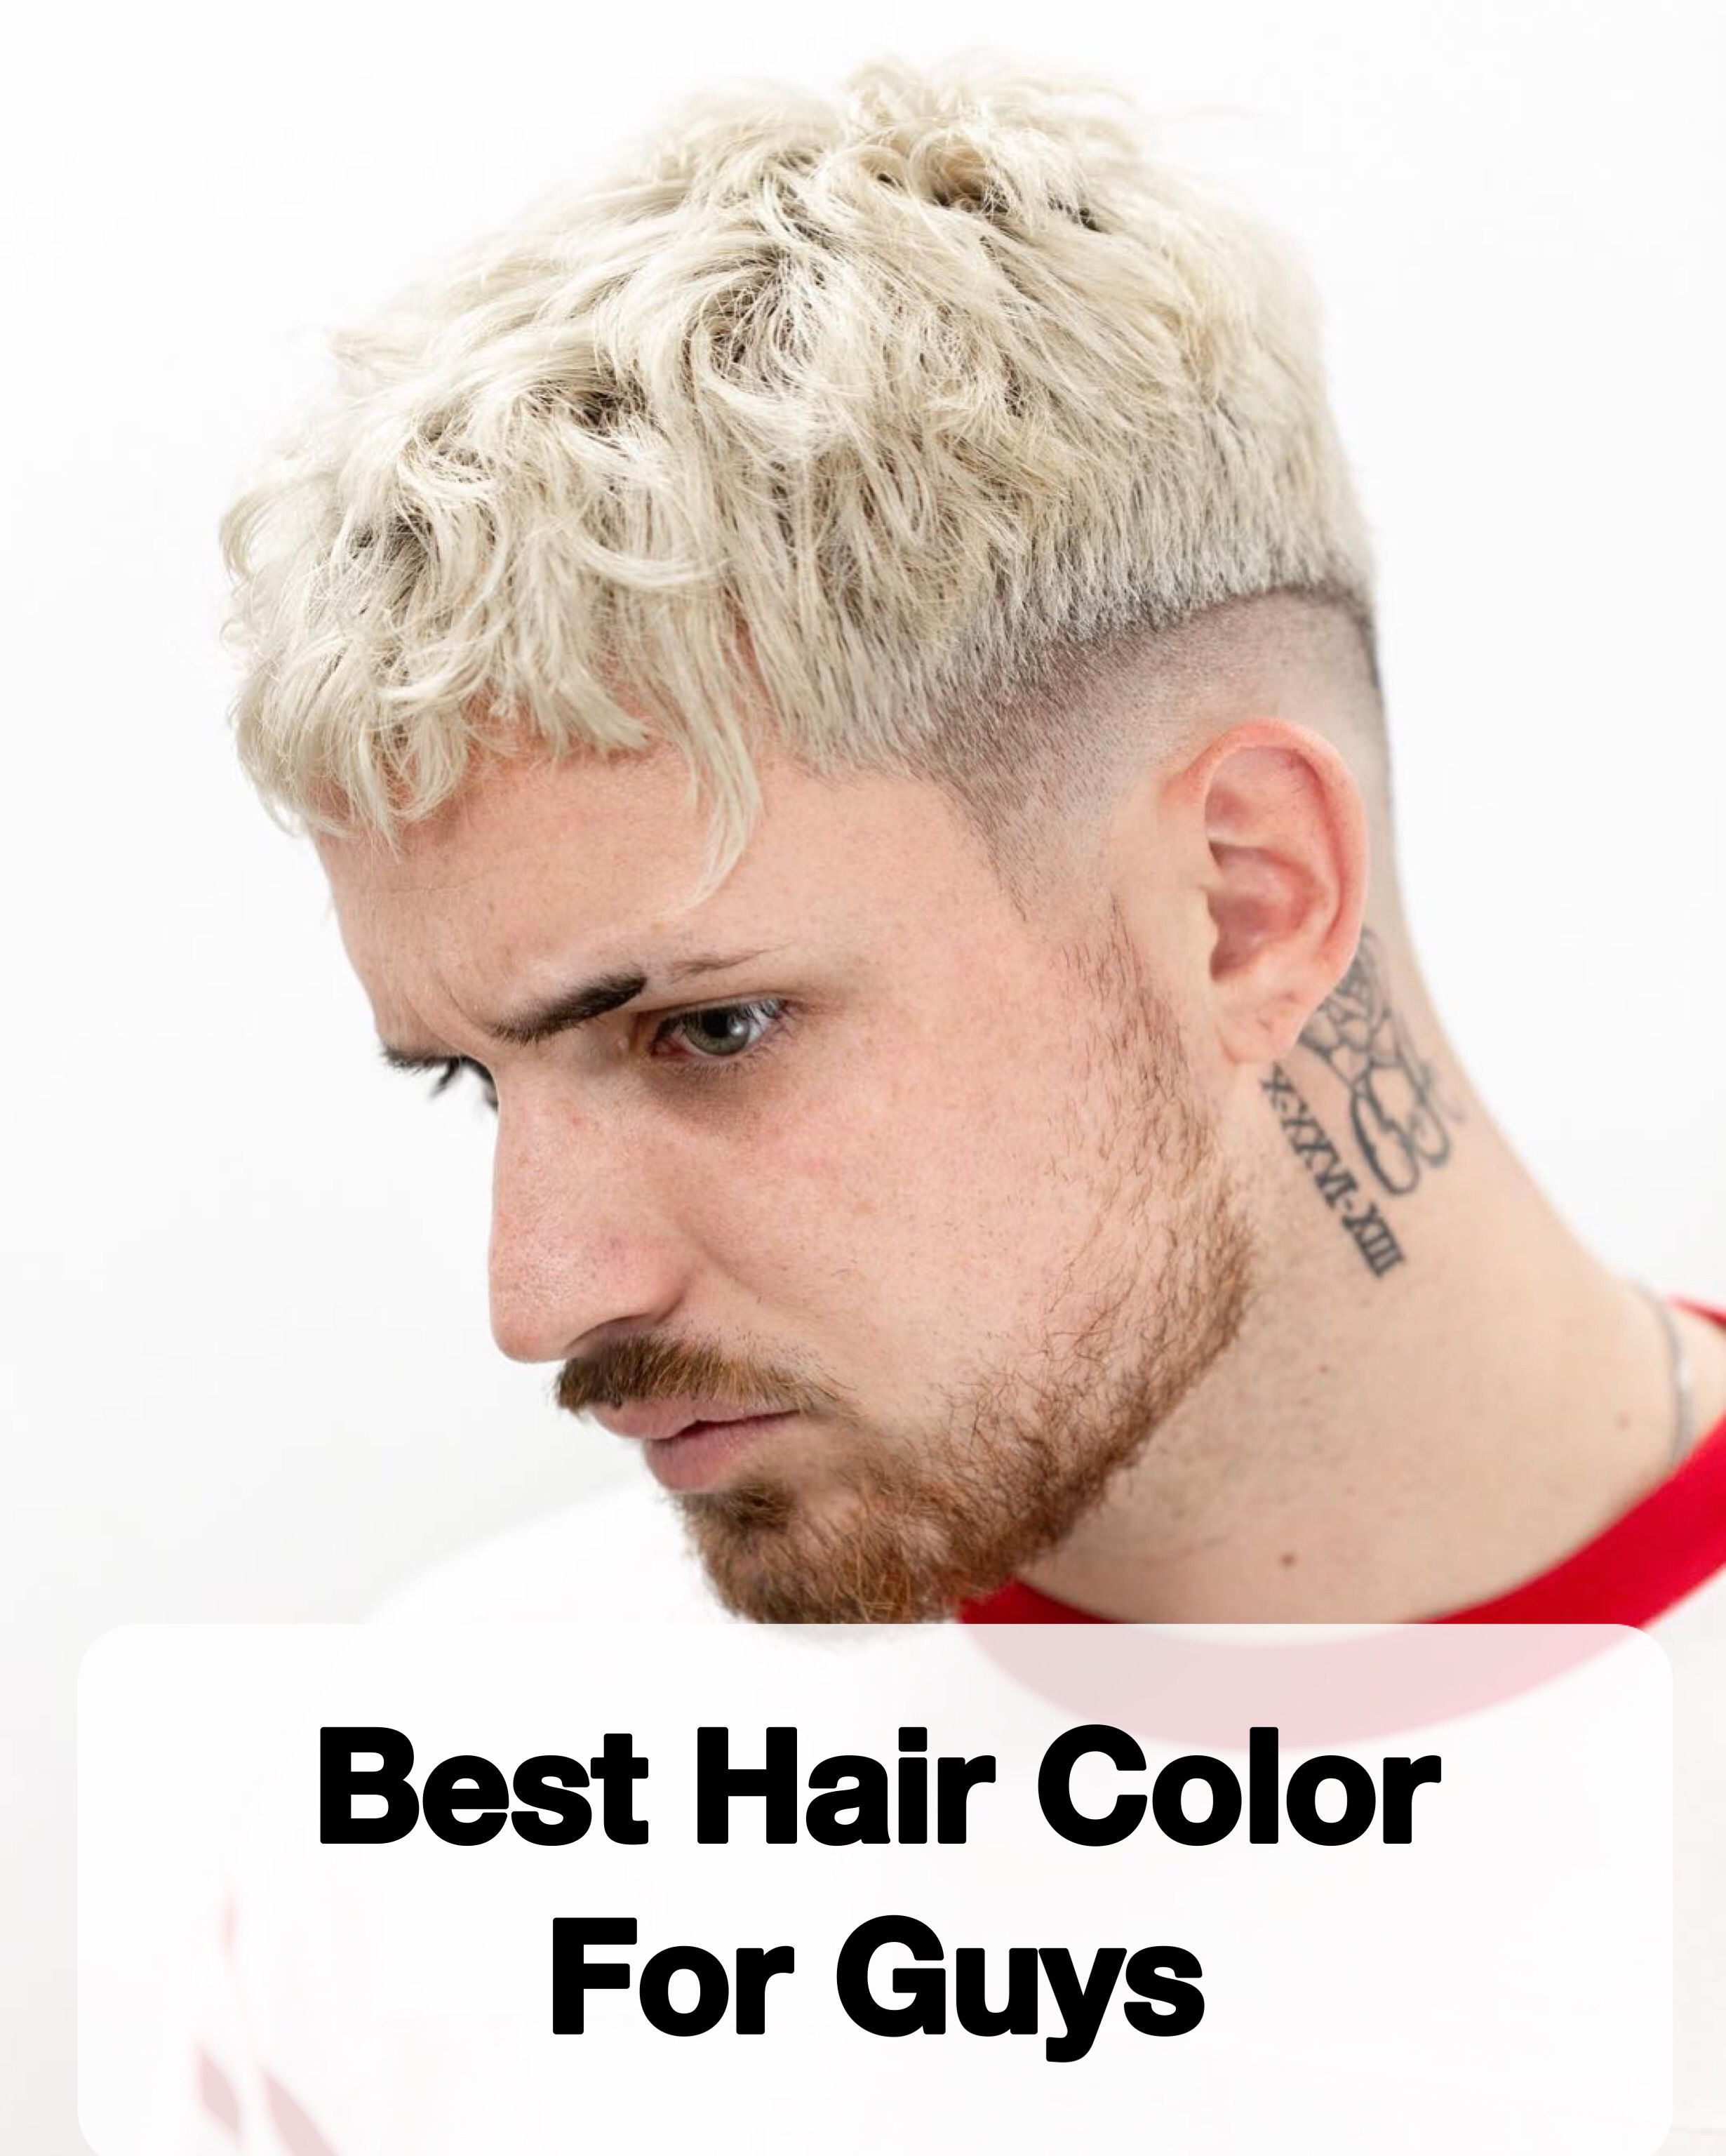 20 Best Hair Color For Guys In 2018 Hair Make Up Pinterest